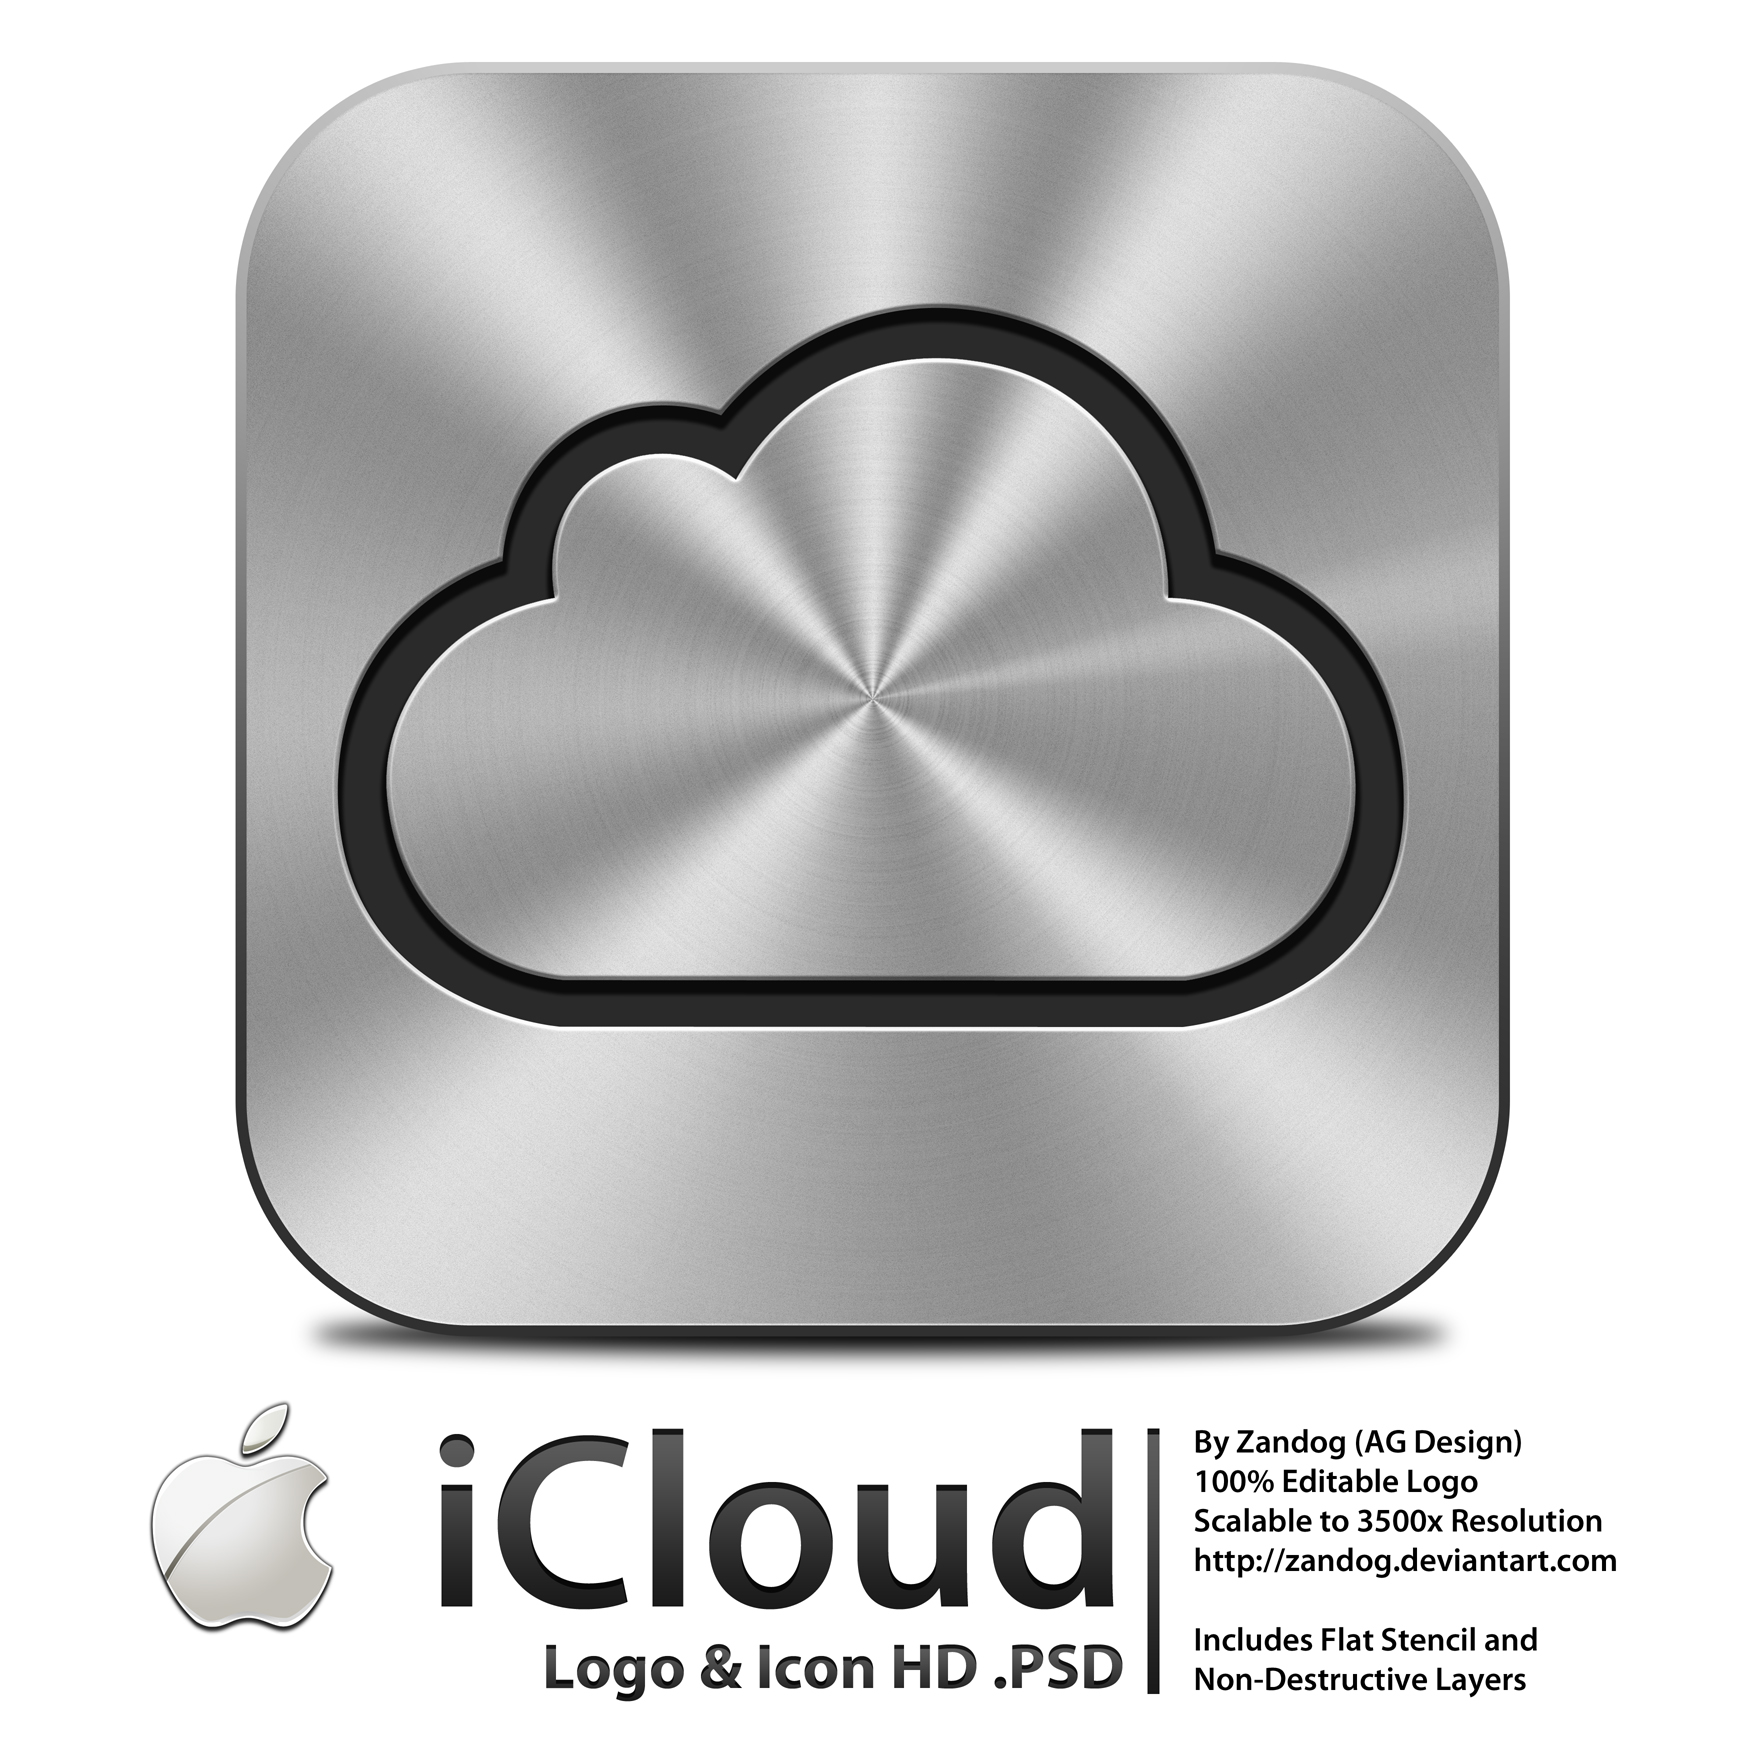 Apple Icloud Logo Icon Psd By Zandog On Deviantart